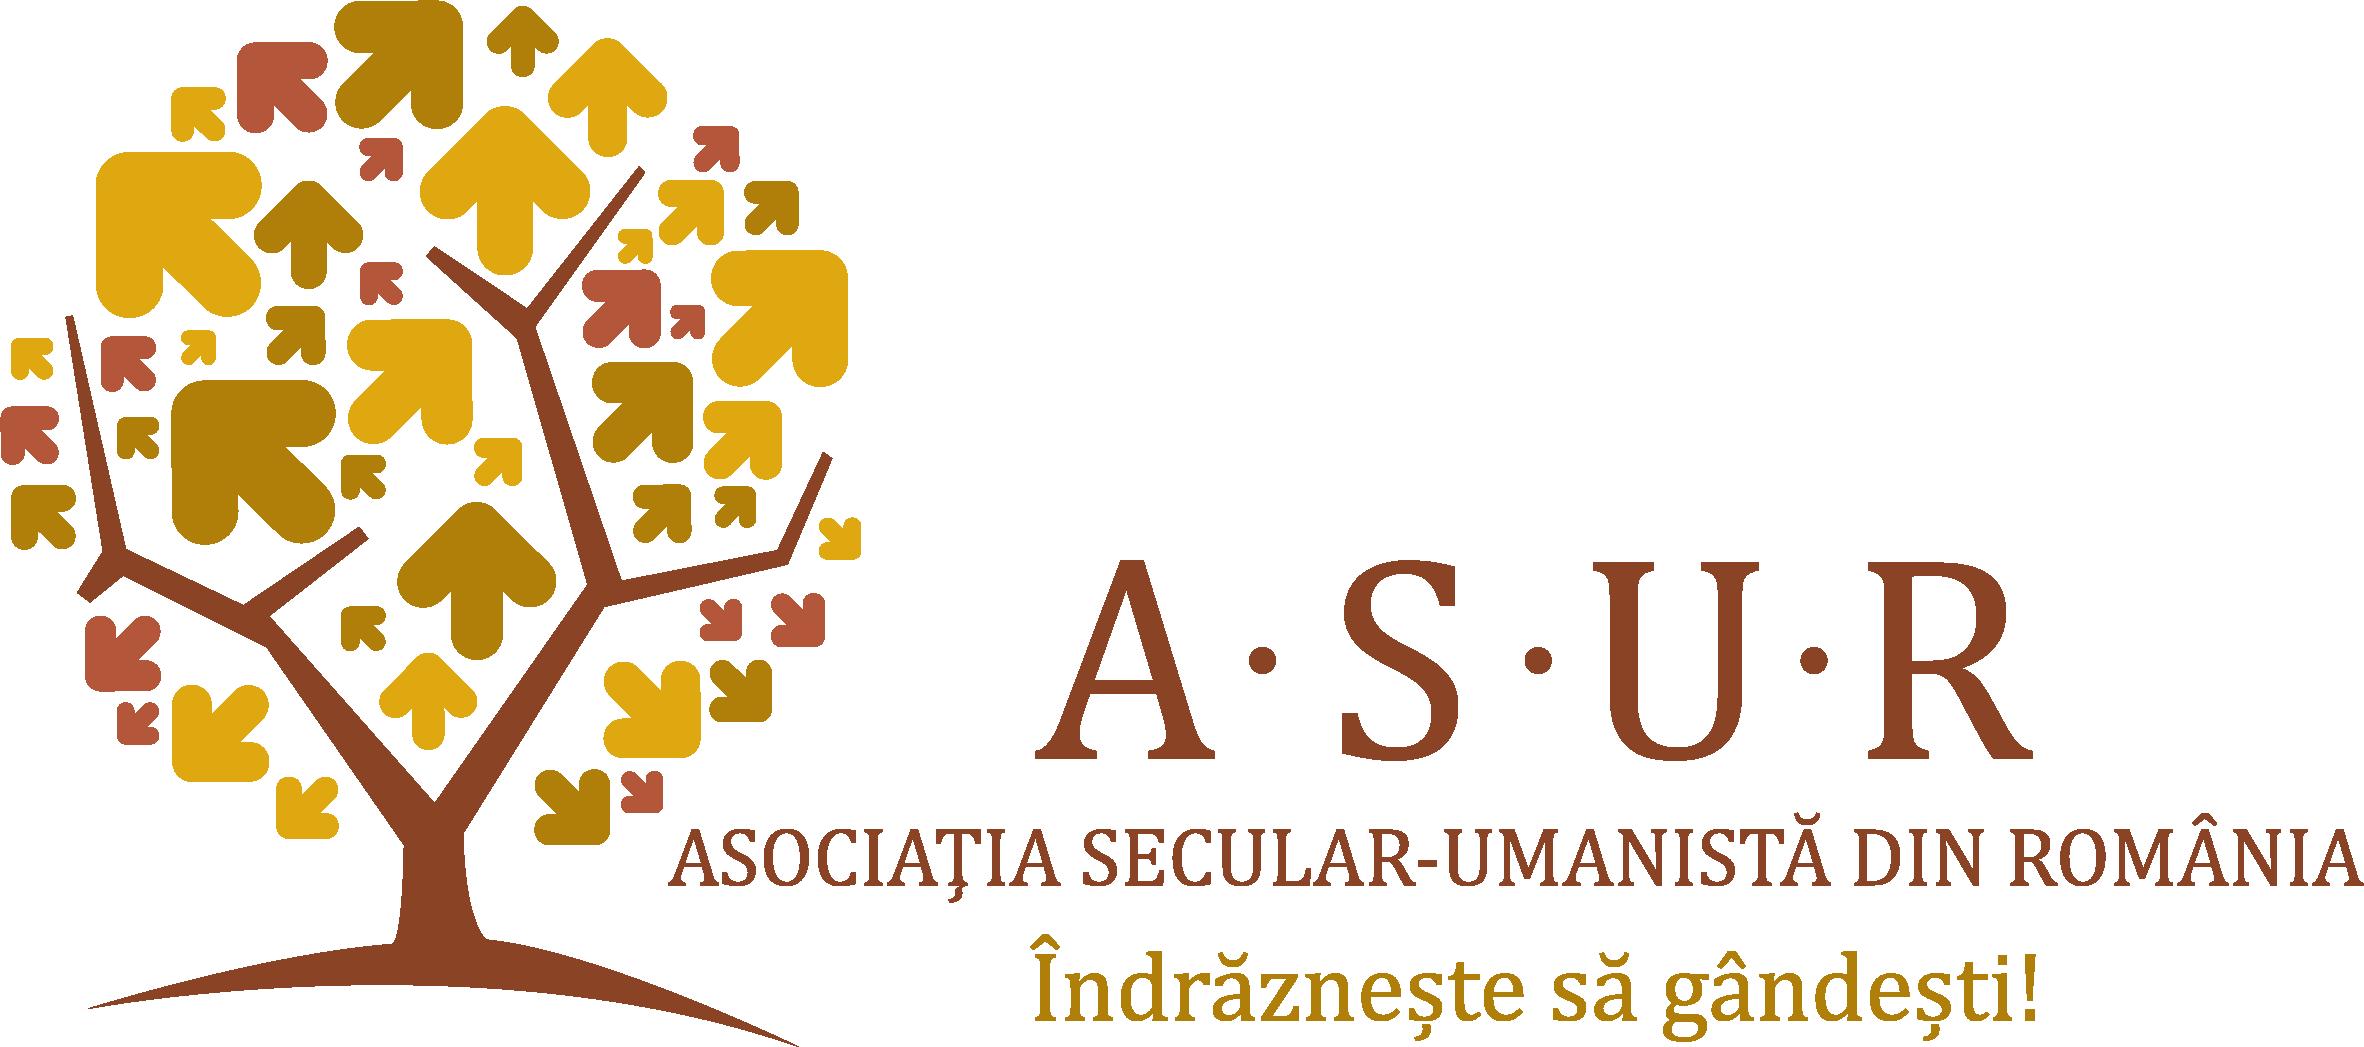 ASUR - Asociatia Secular-Umanista din Romania logo